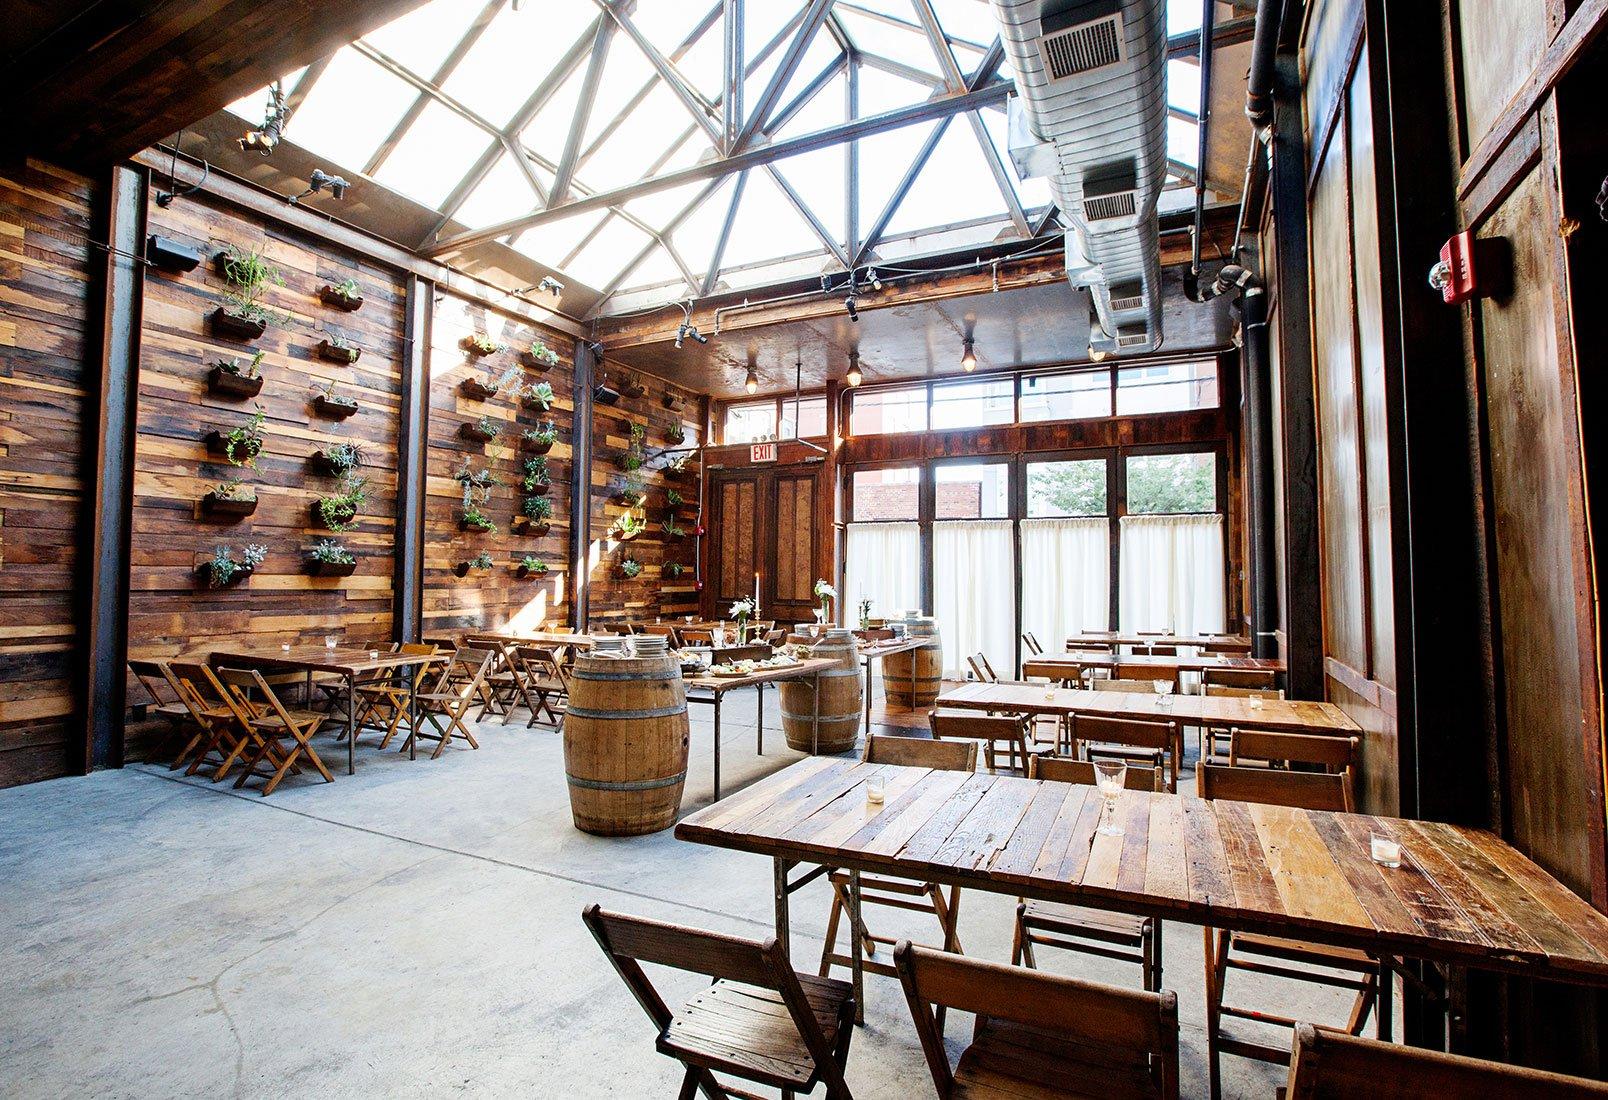 Brooklyn Winery in Williamsburg, Brooklyn